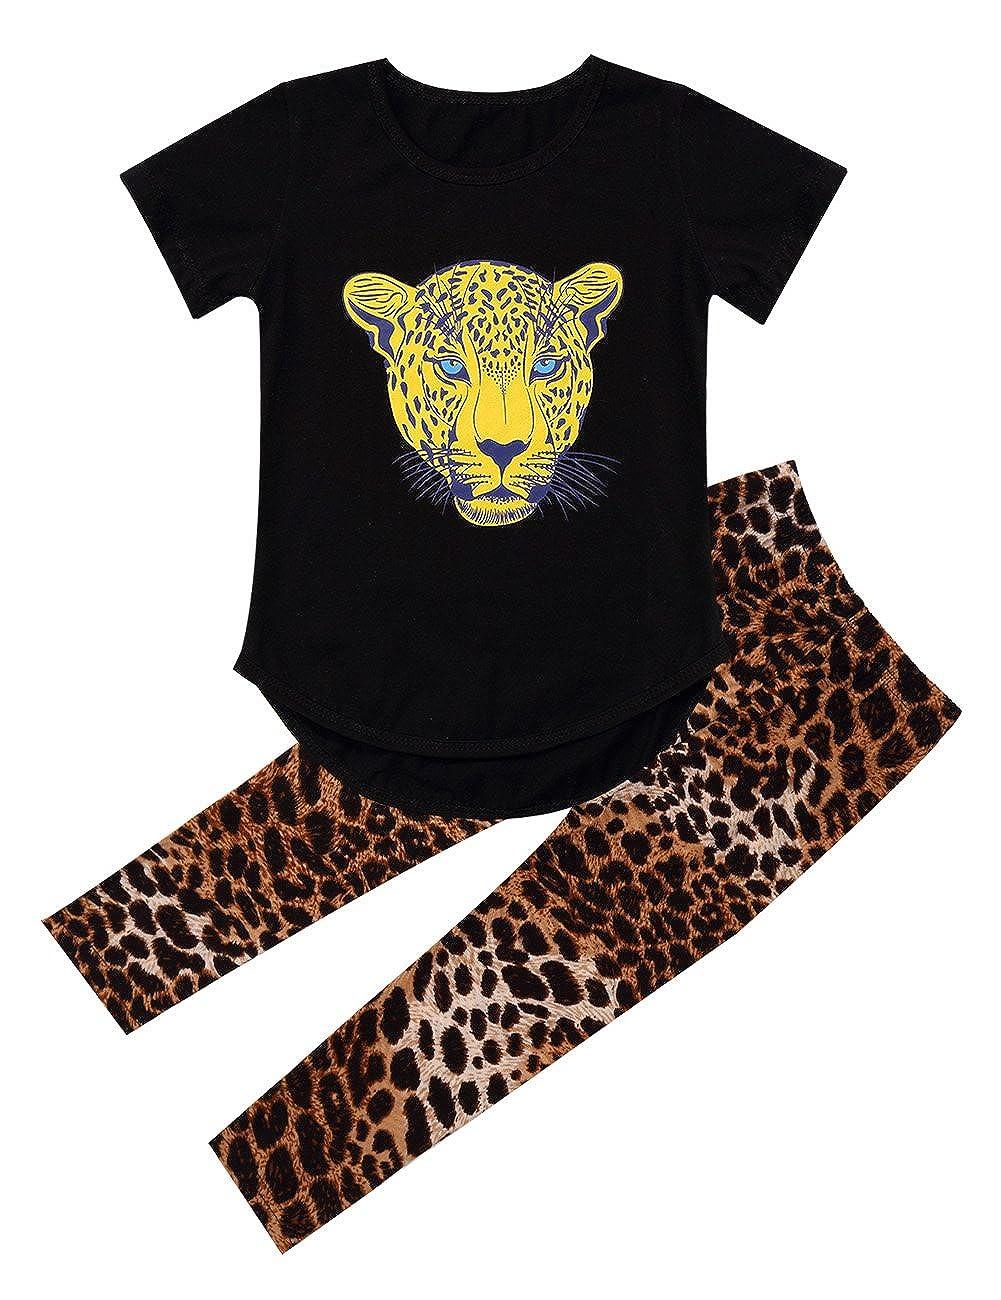 Girls Leopard Head Print T-shirt Short Sleeve Tops Skinny Legging Pants Clothing Set